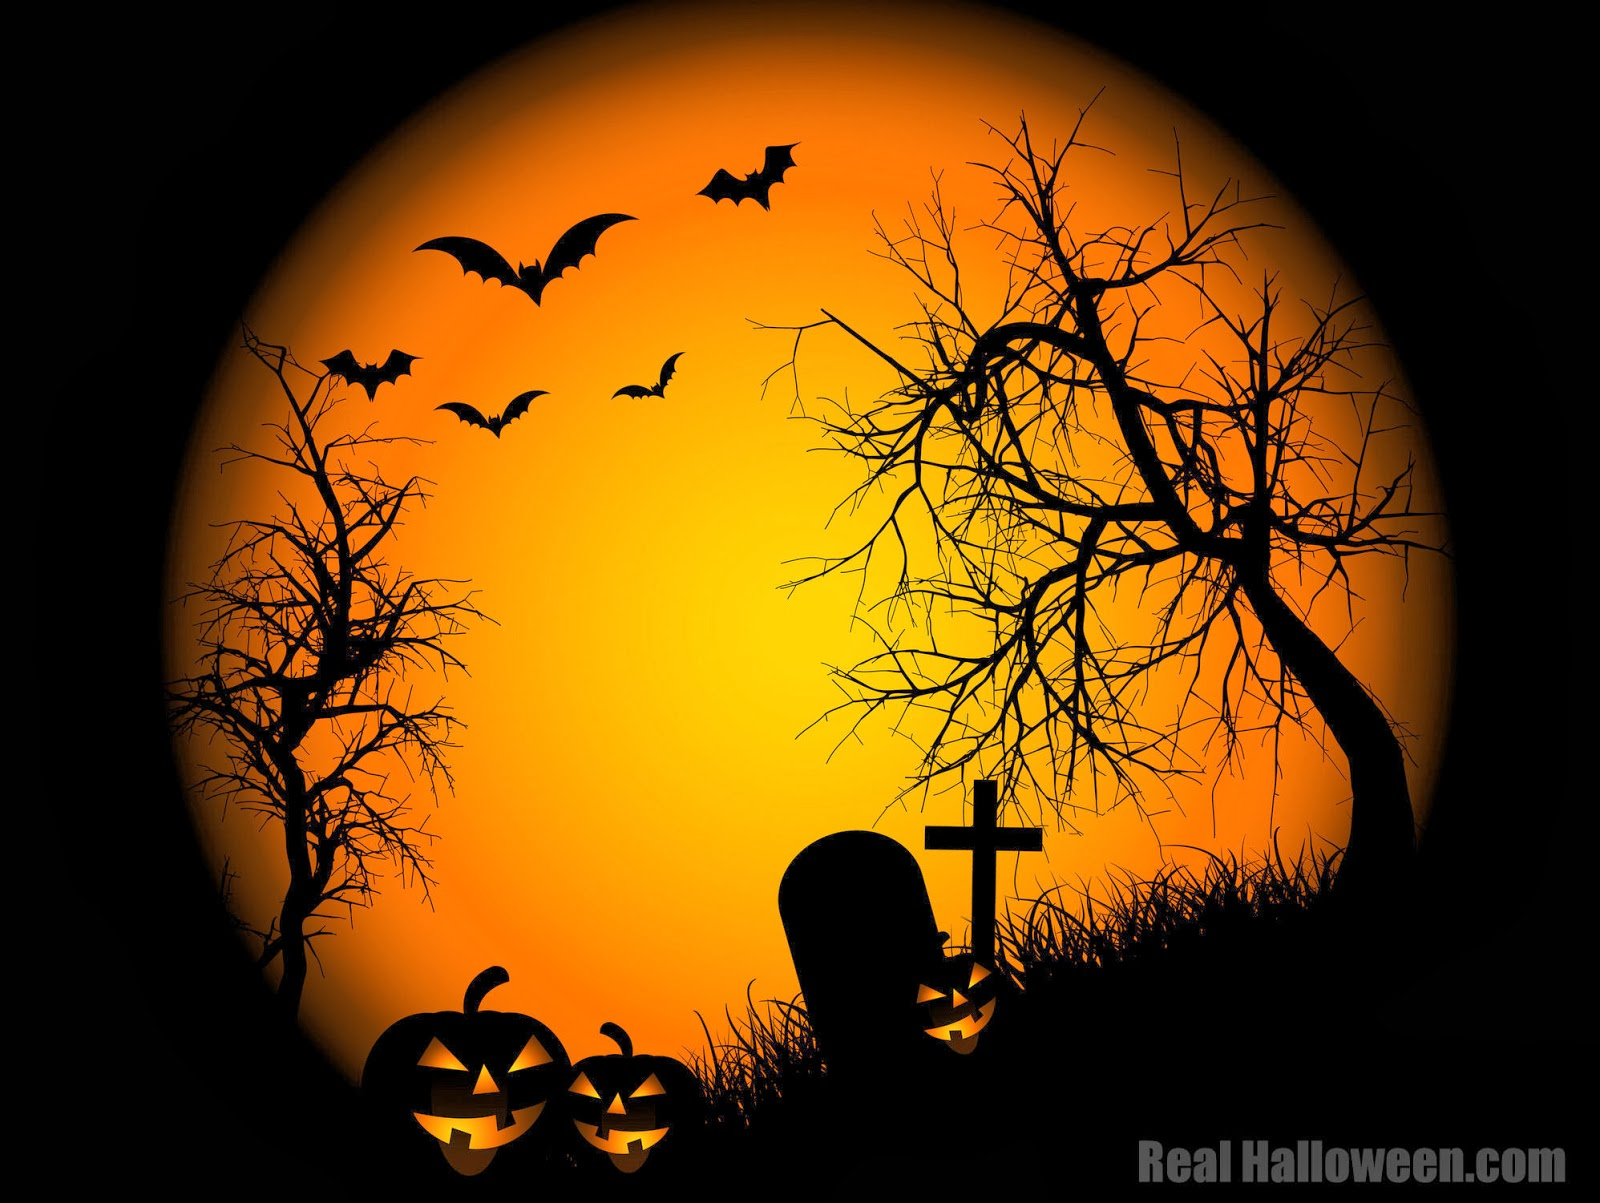 Hd wallpapers blog halloween quotes - Free widescreen halloween wallpaper ...